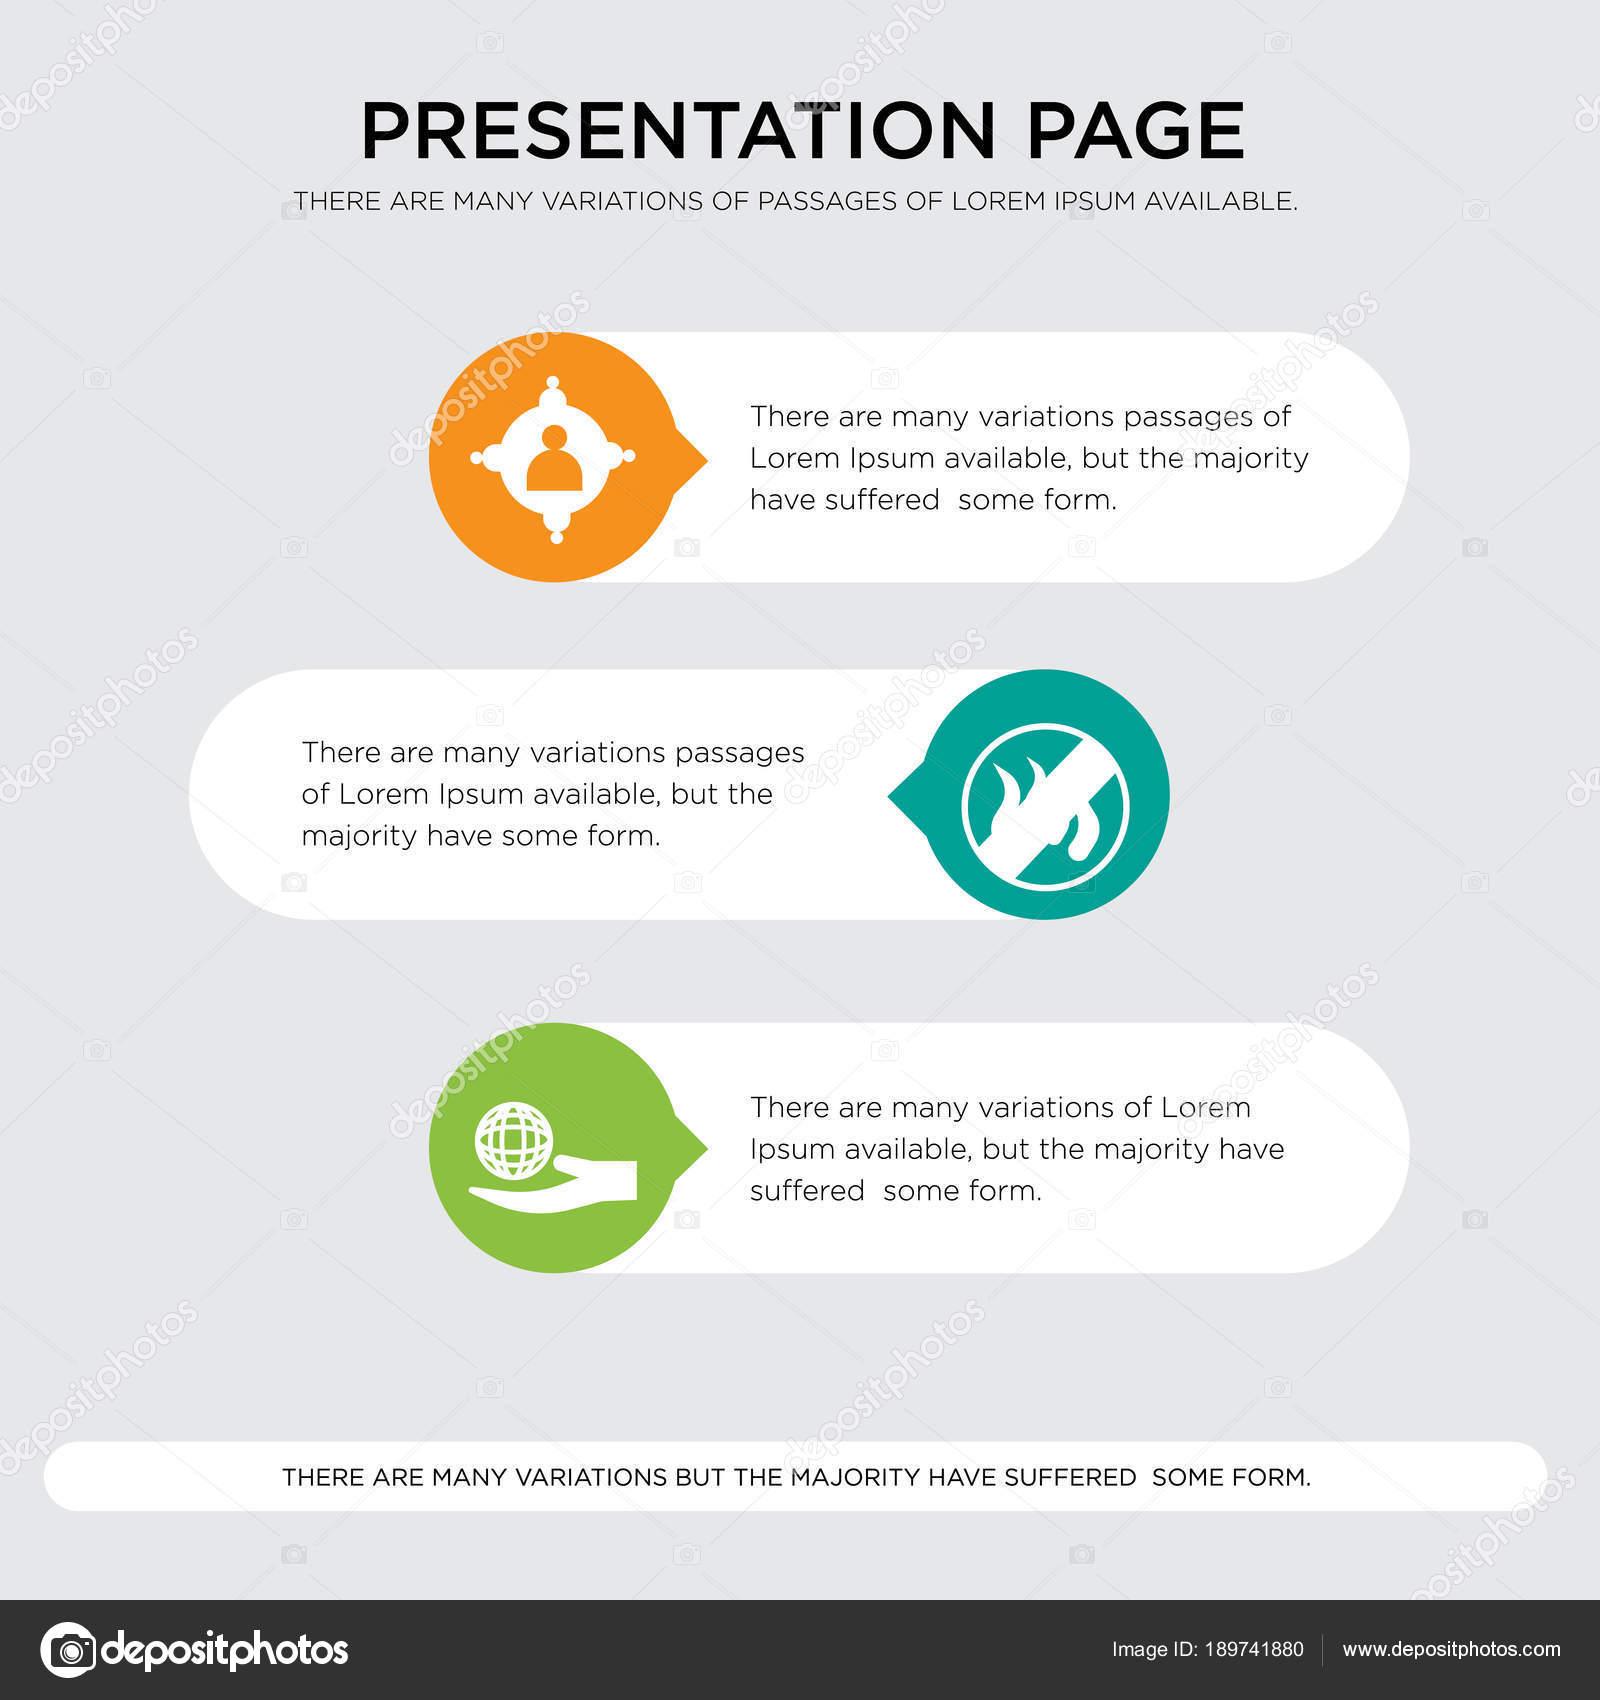 Employee engagement presentation by big ideas hr.